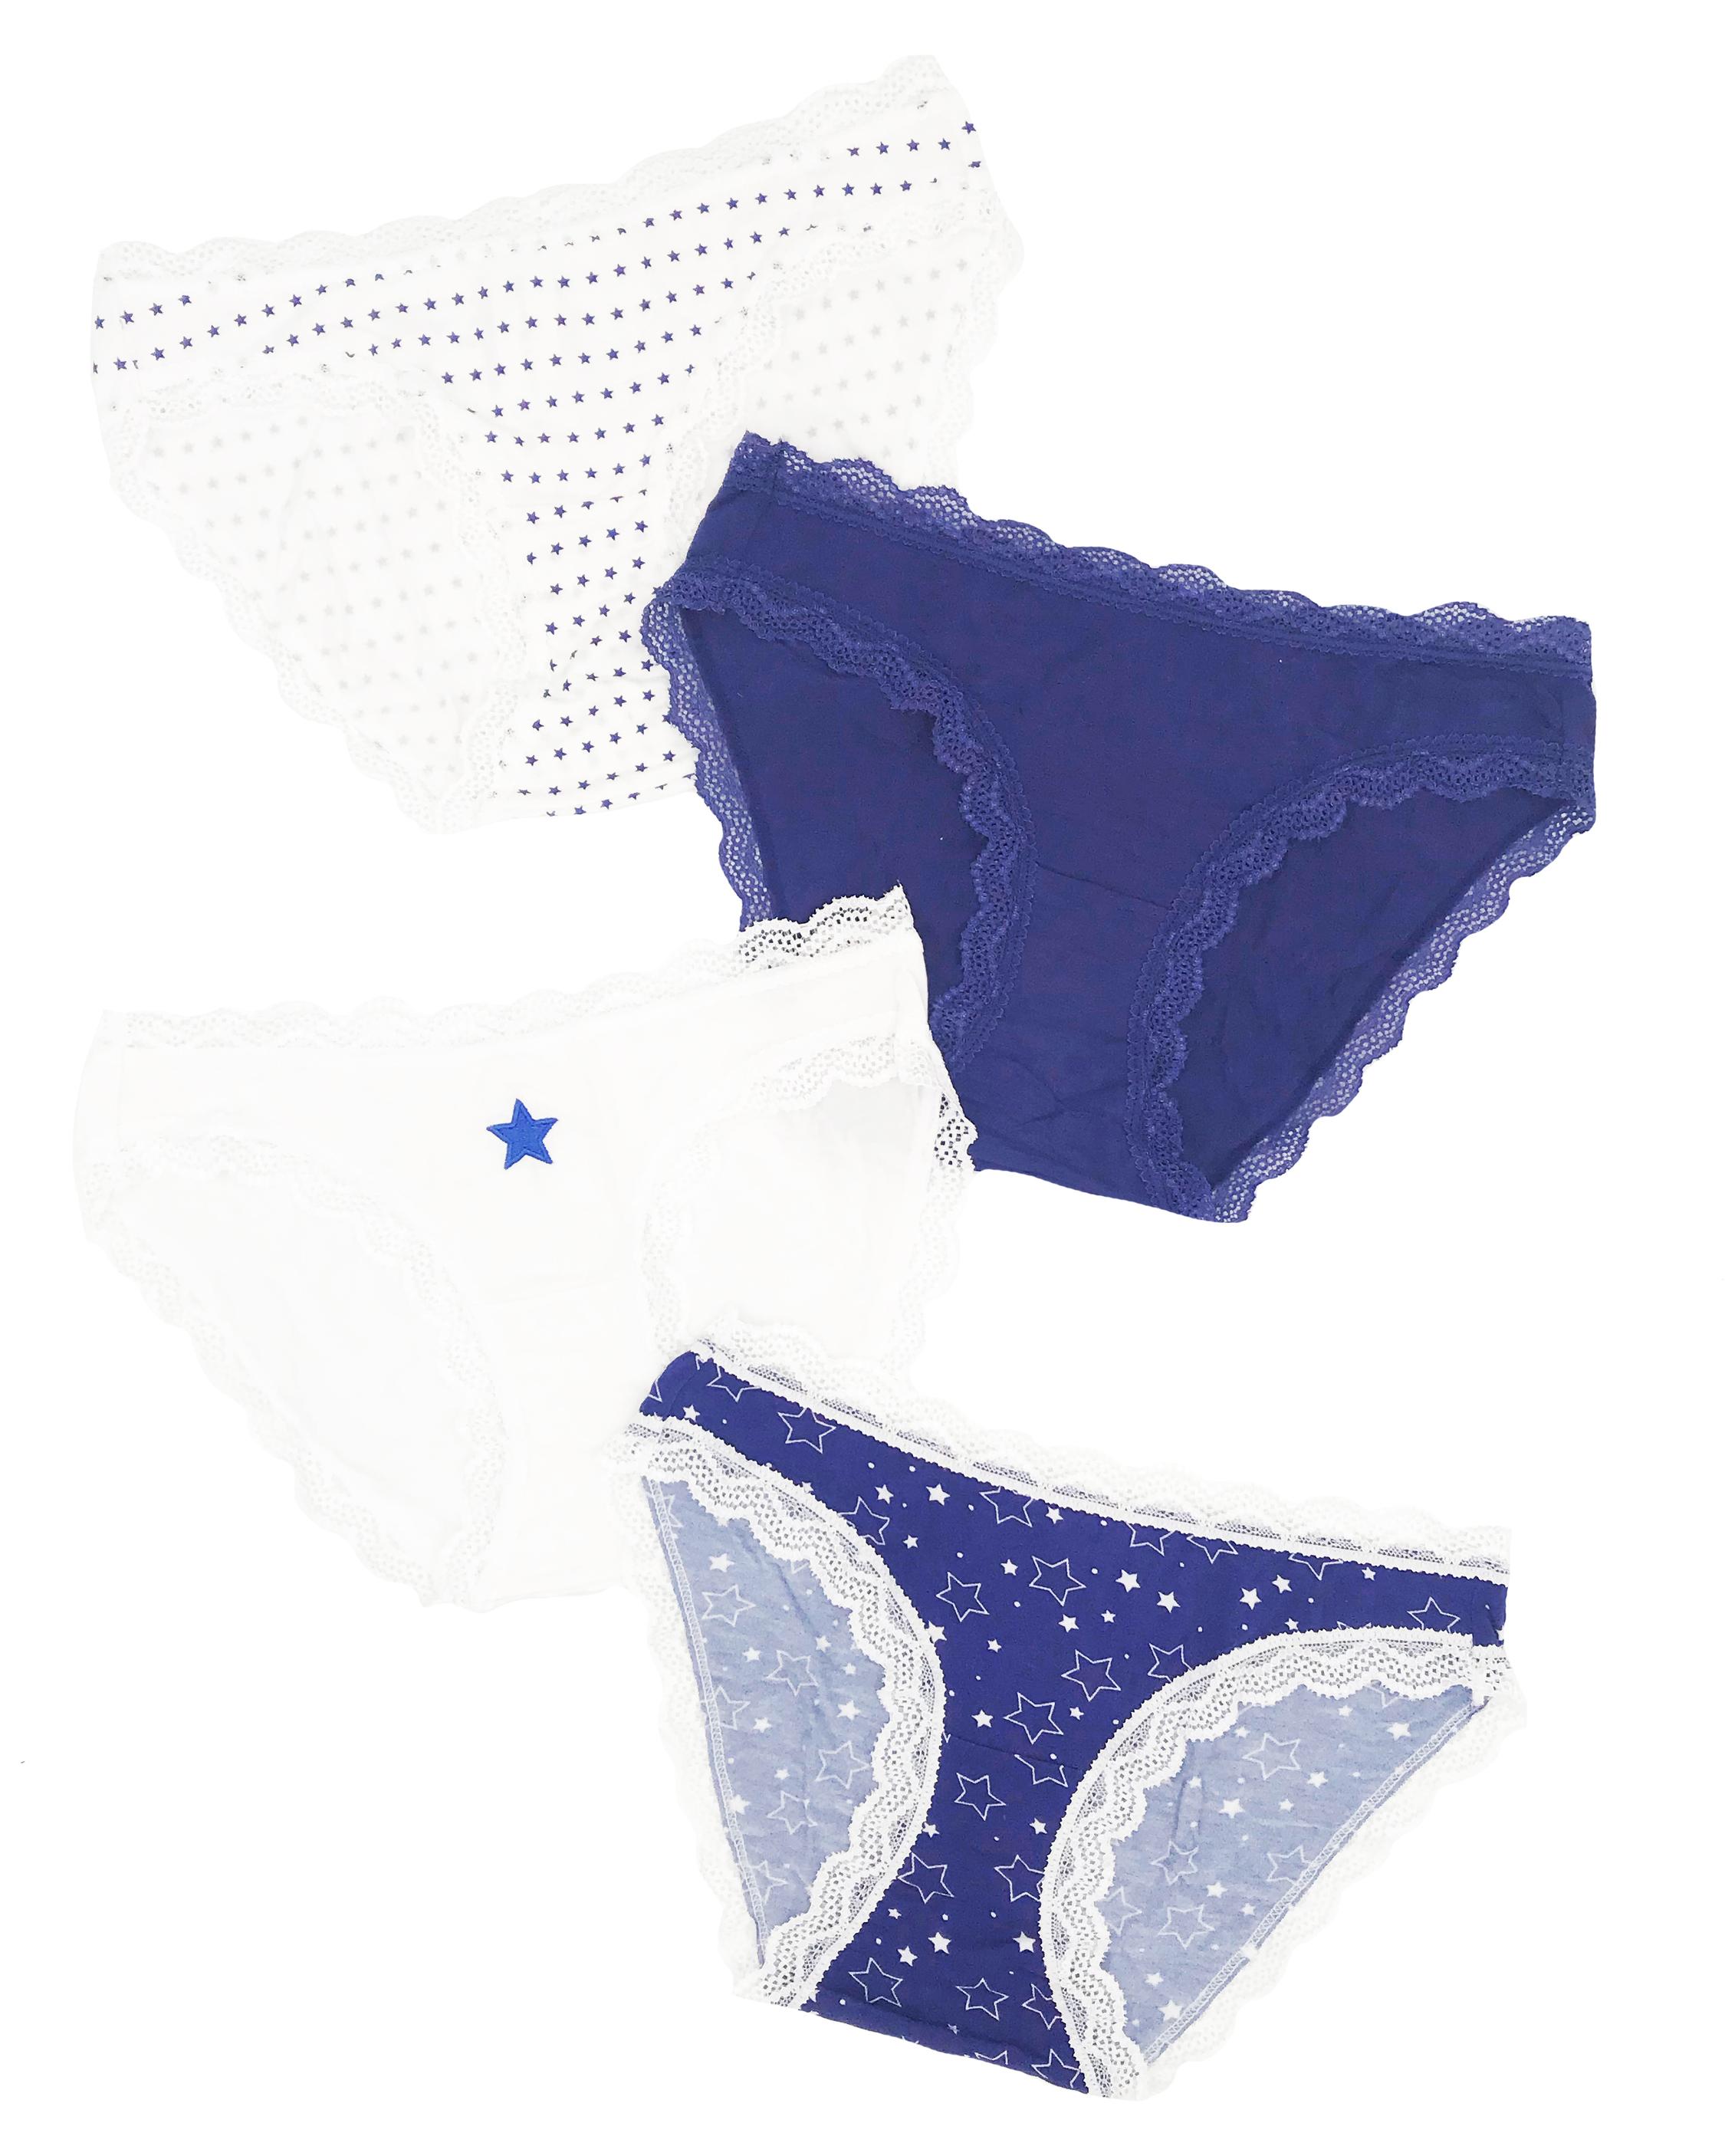 Stripe & Stare Starry Night Knicker Box 4PK 1